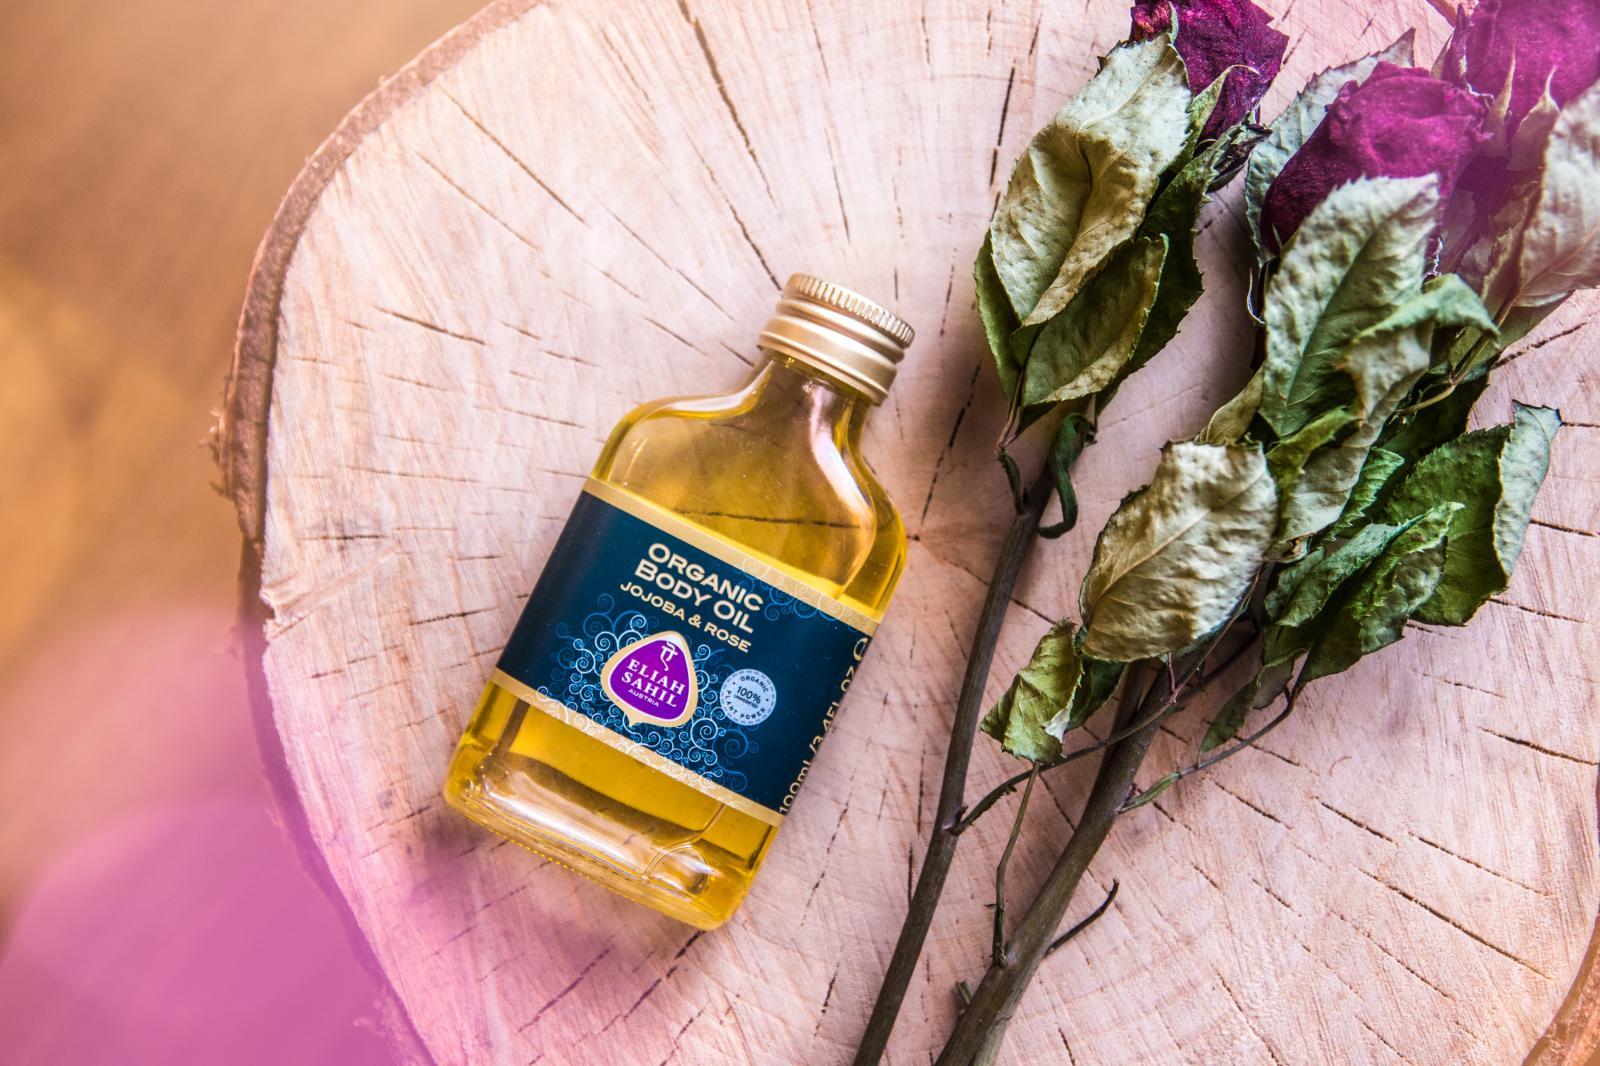 Recenze: Bio jojobový olej s růží (Eliah Sahil)